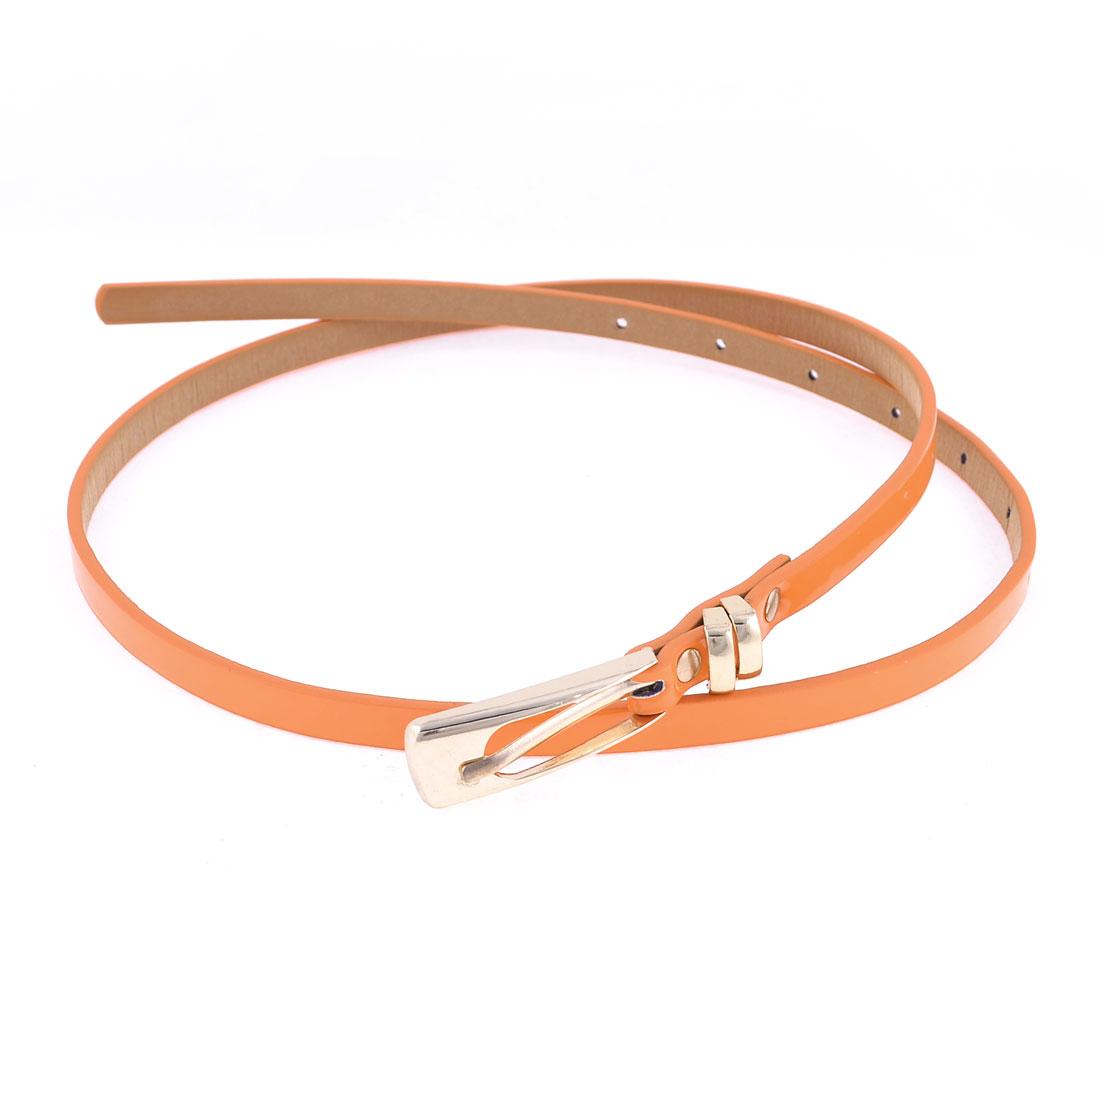 Orange Metal One Pin Buckle Fuax Leather Slender Slim Waist Belt for Women